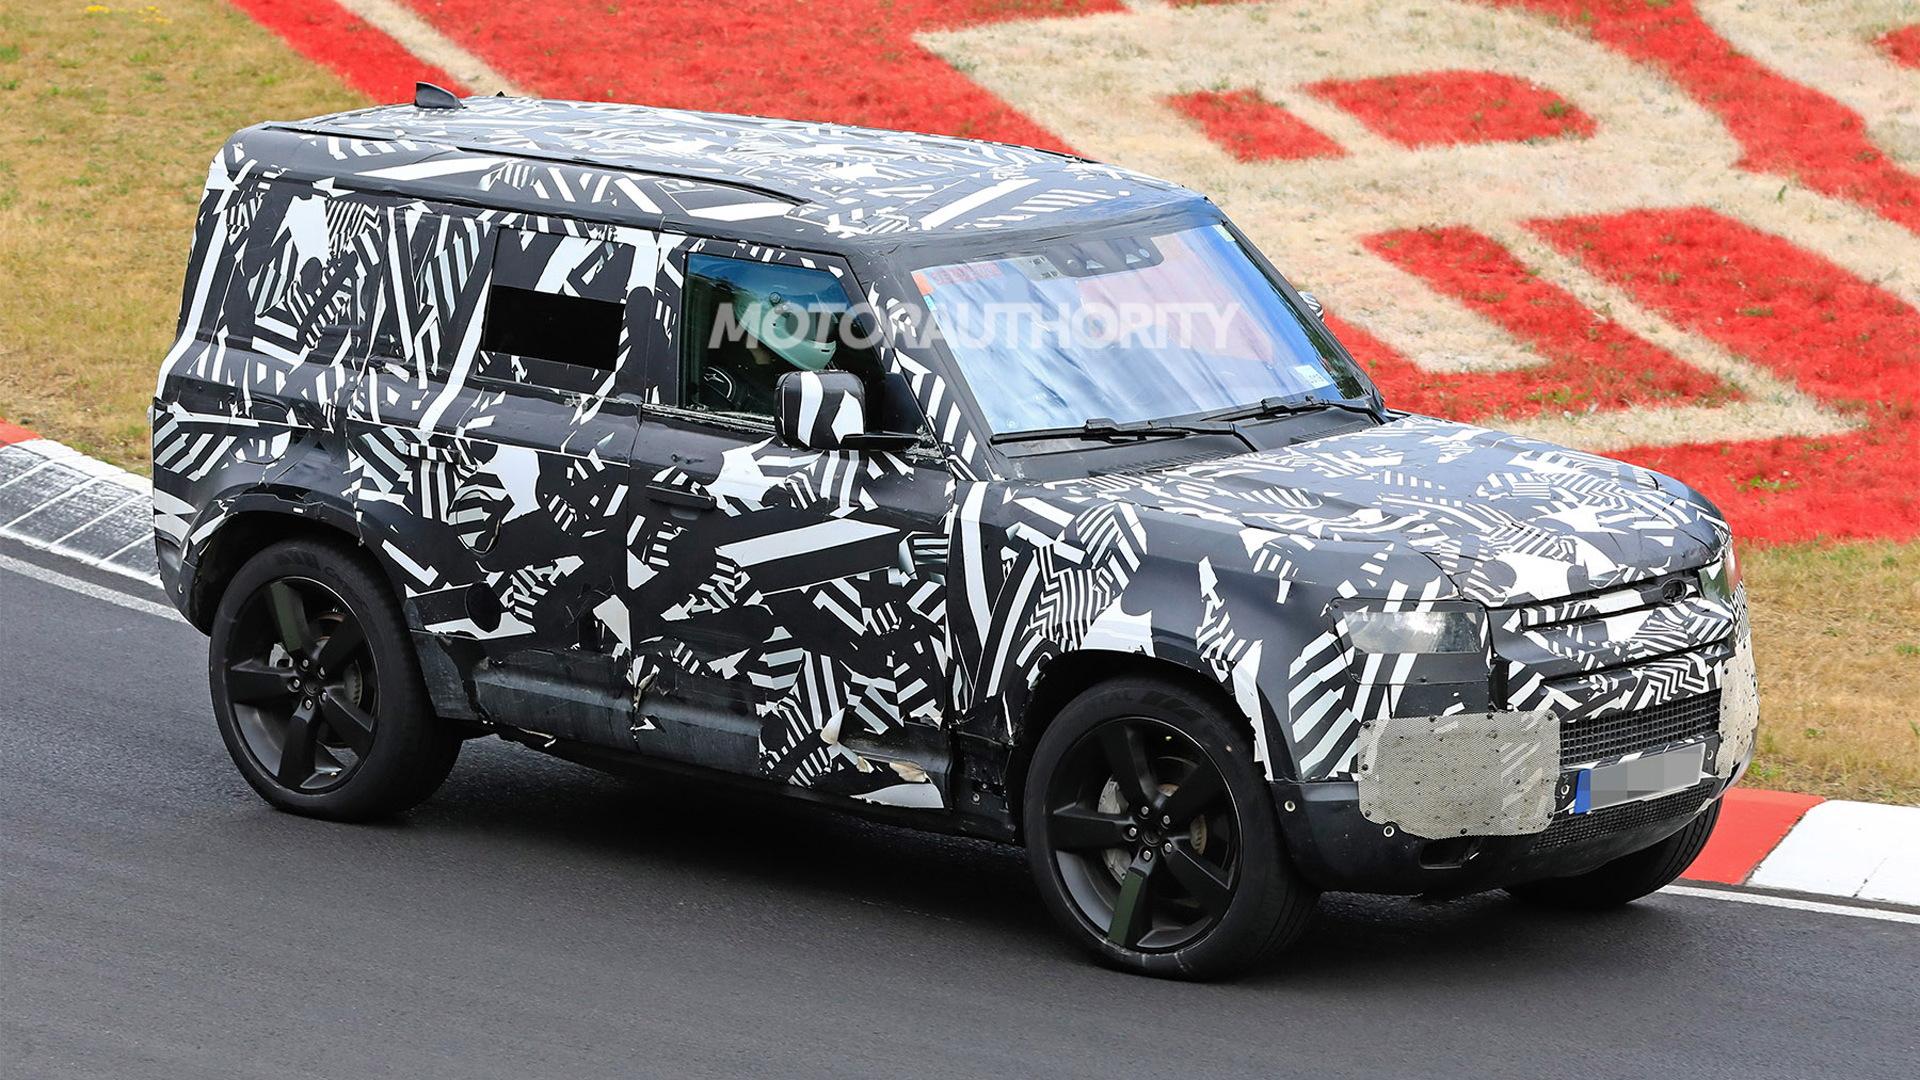 2020 Land Rover Defender 110 spy shots - Image via S. Baldauf/SB-Medien